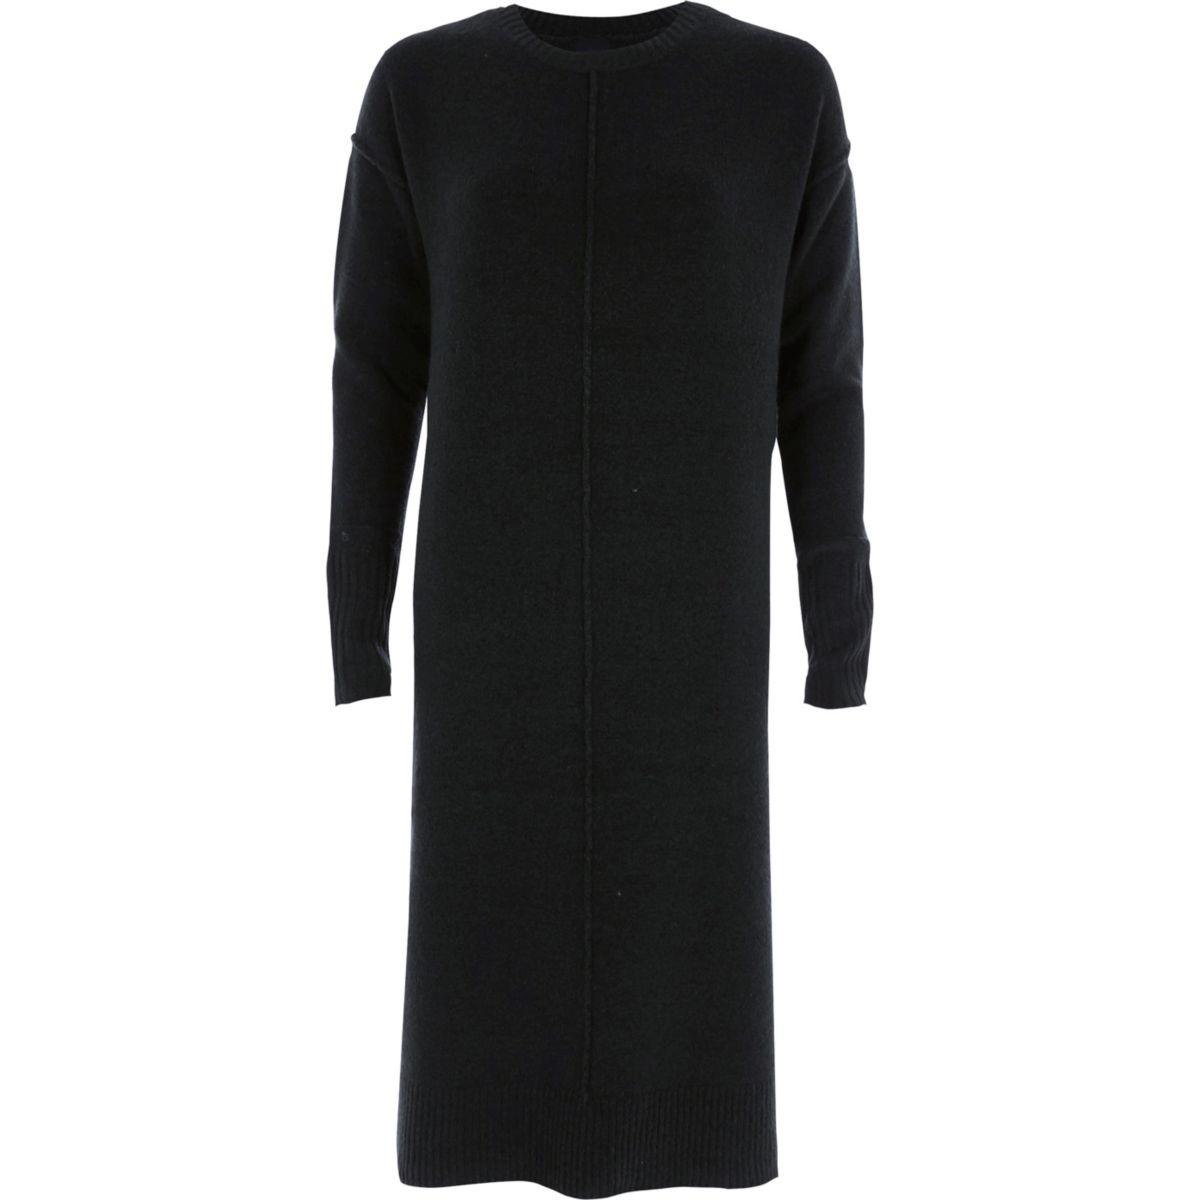 Dark green long sleeve knitted dress